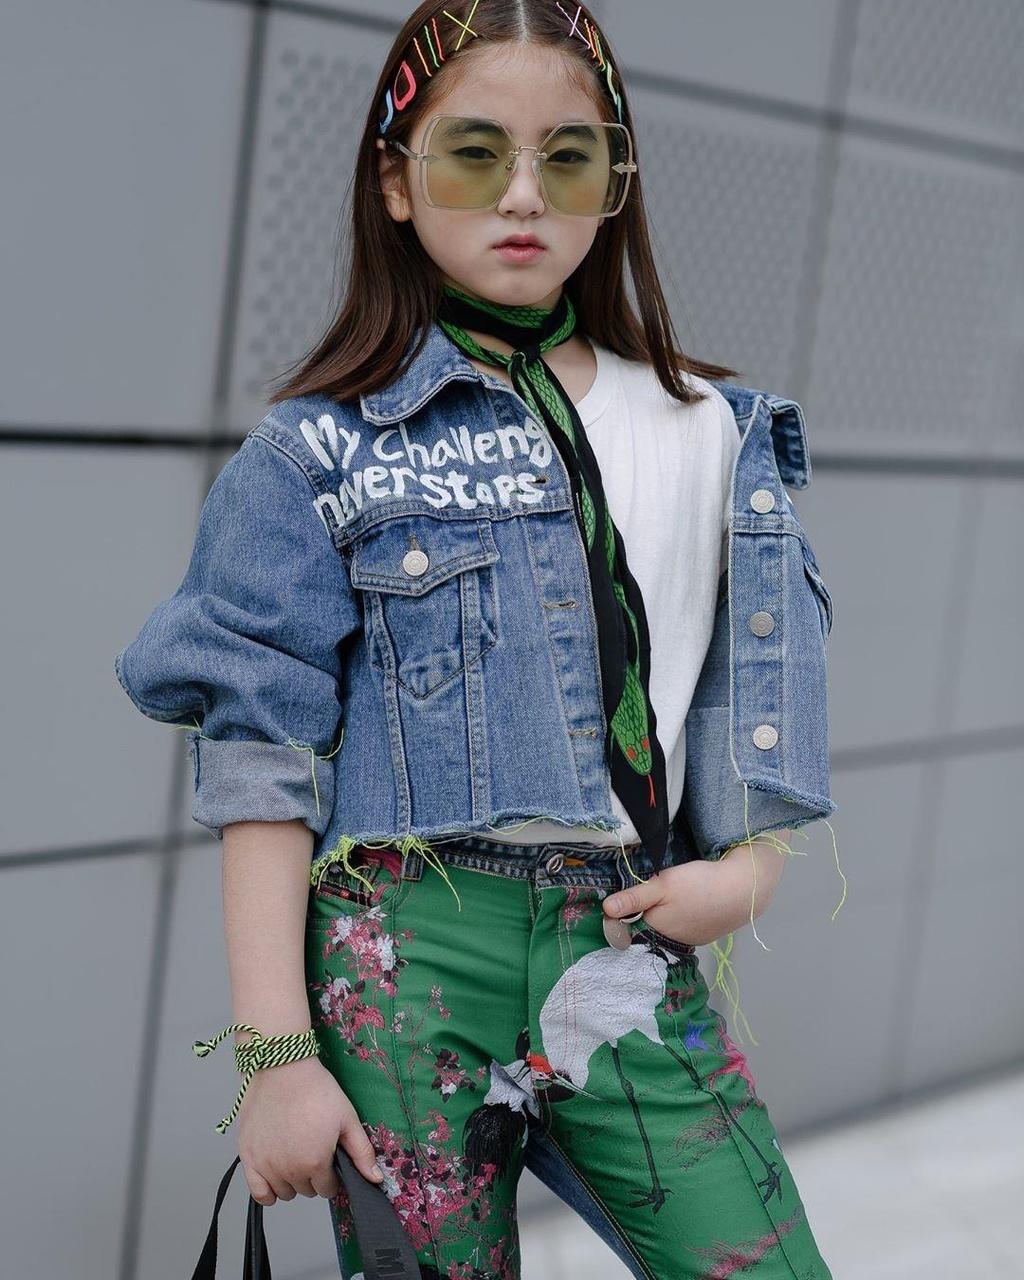 Hinh anh A quan The Face tai Seoul Fashion Week len Vogue hinh anh 23